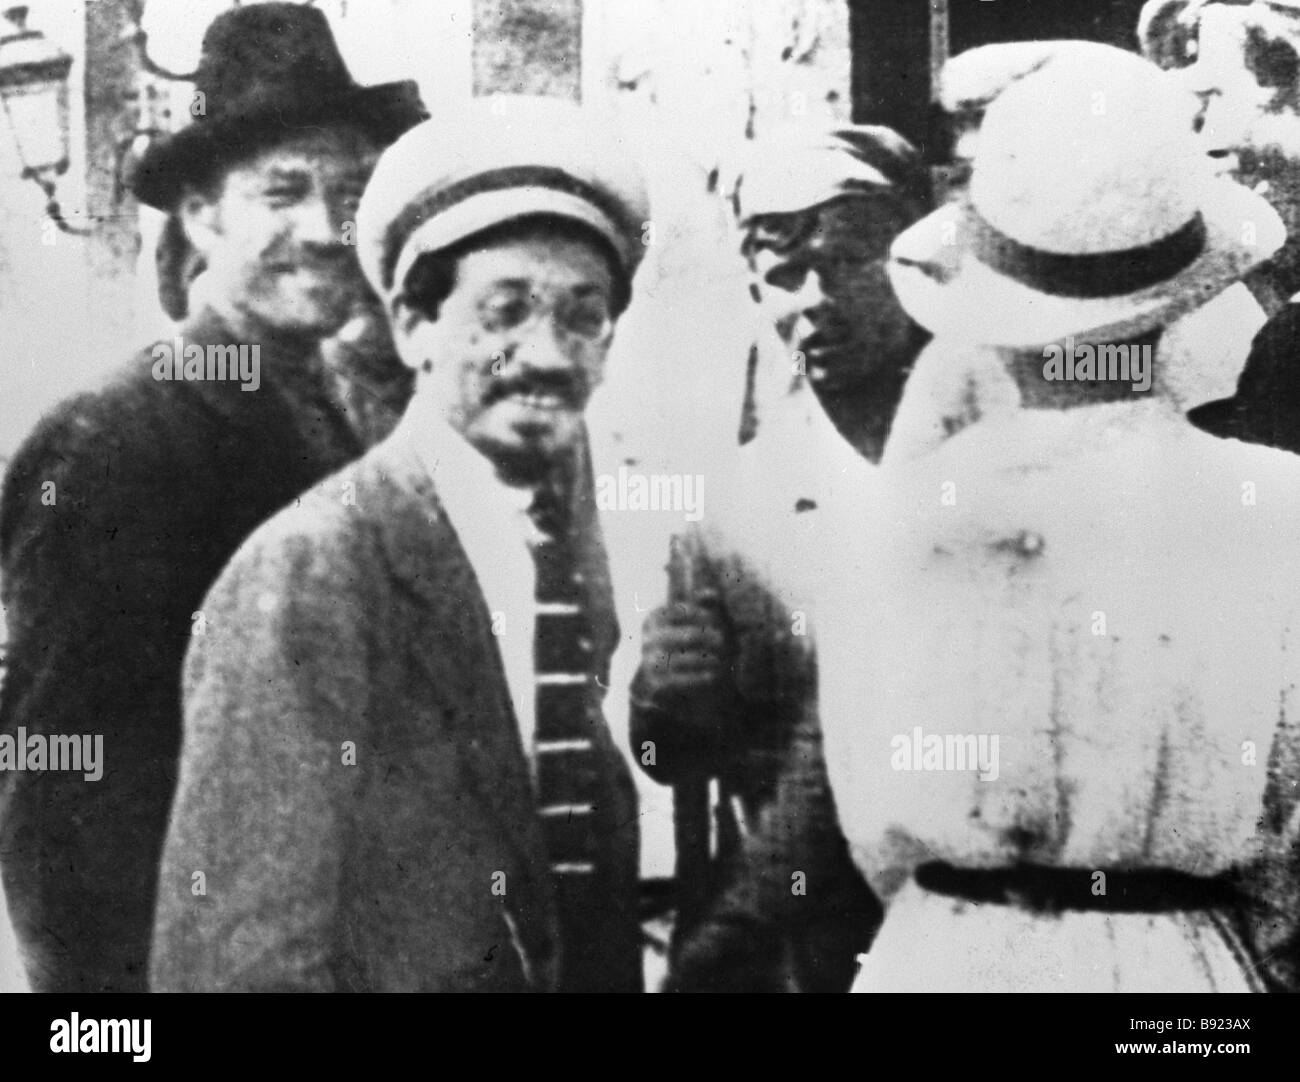 Soviet political leader Yakov Sverdlov second from left during the 1st Congress of Soviets of Belarus - Stock Image